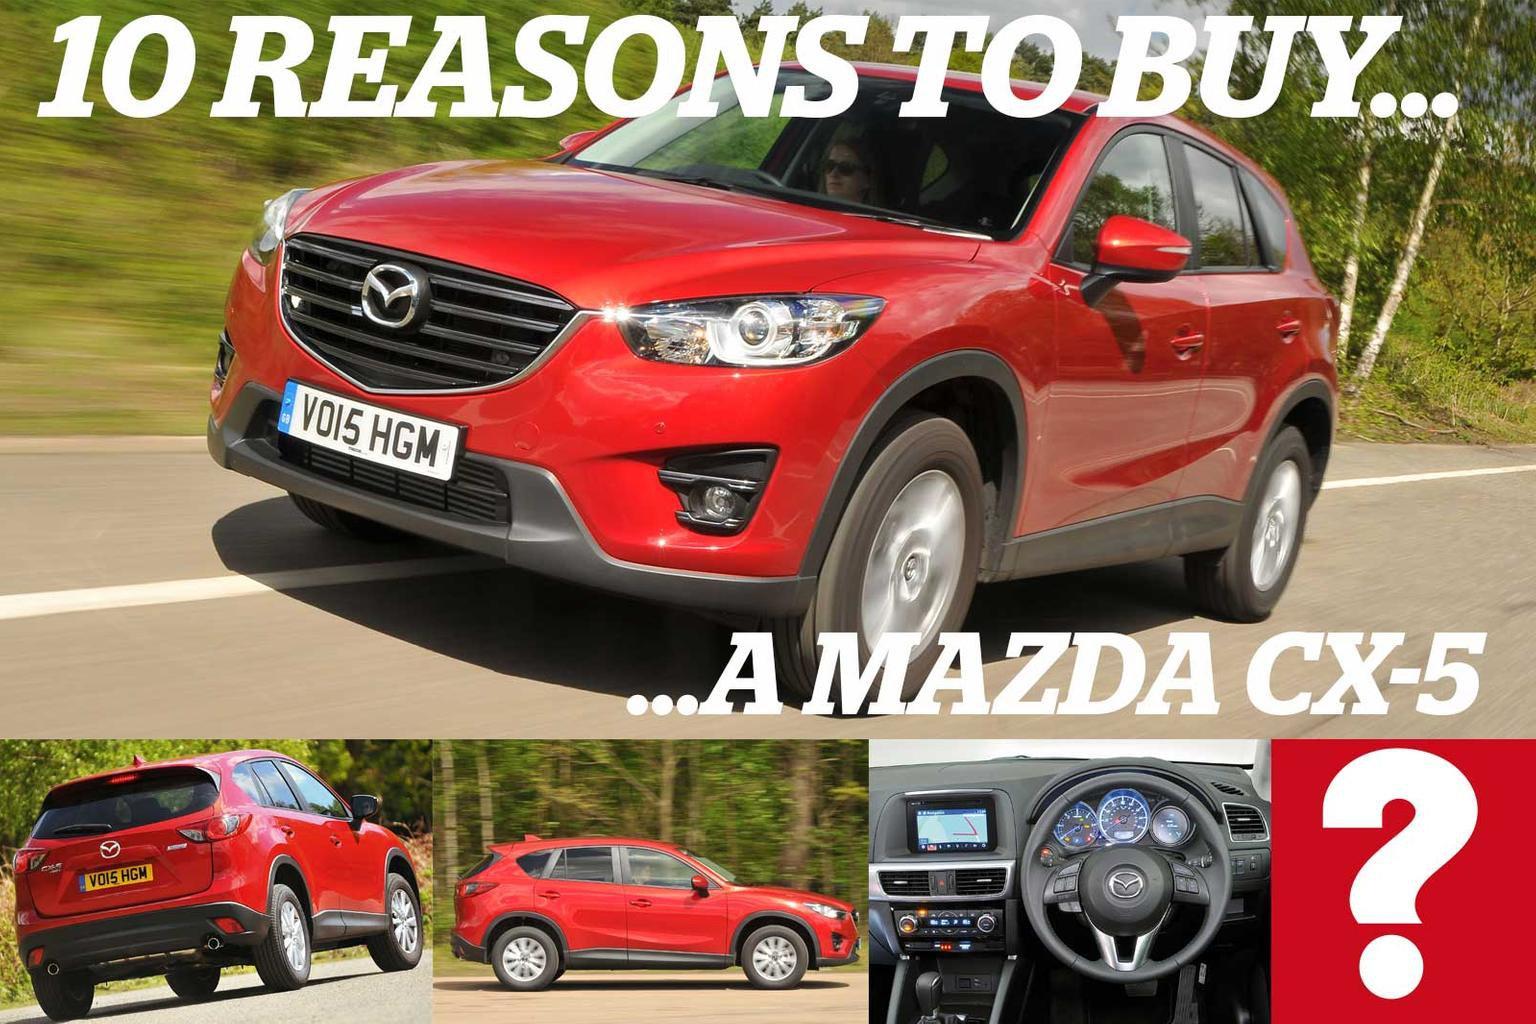 10 reasons to buy a Mazda CX-5